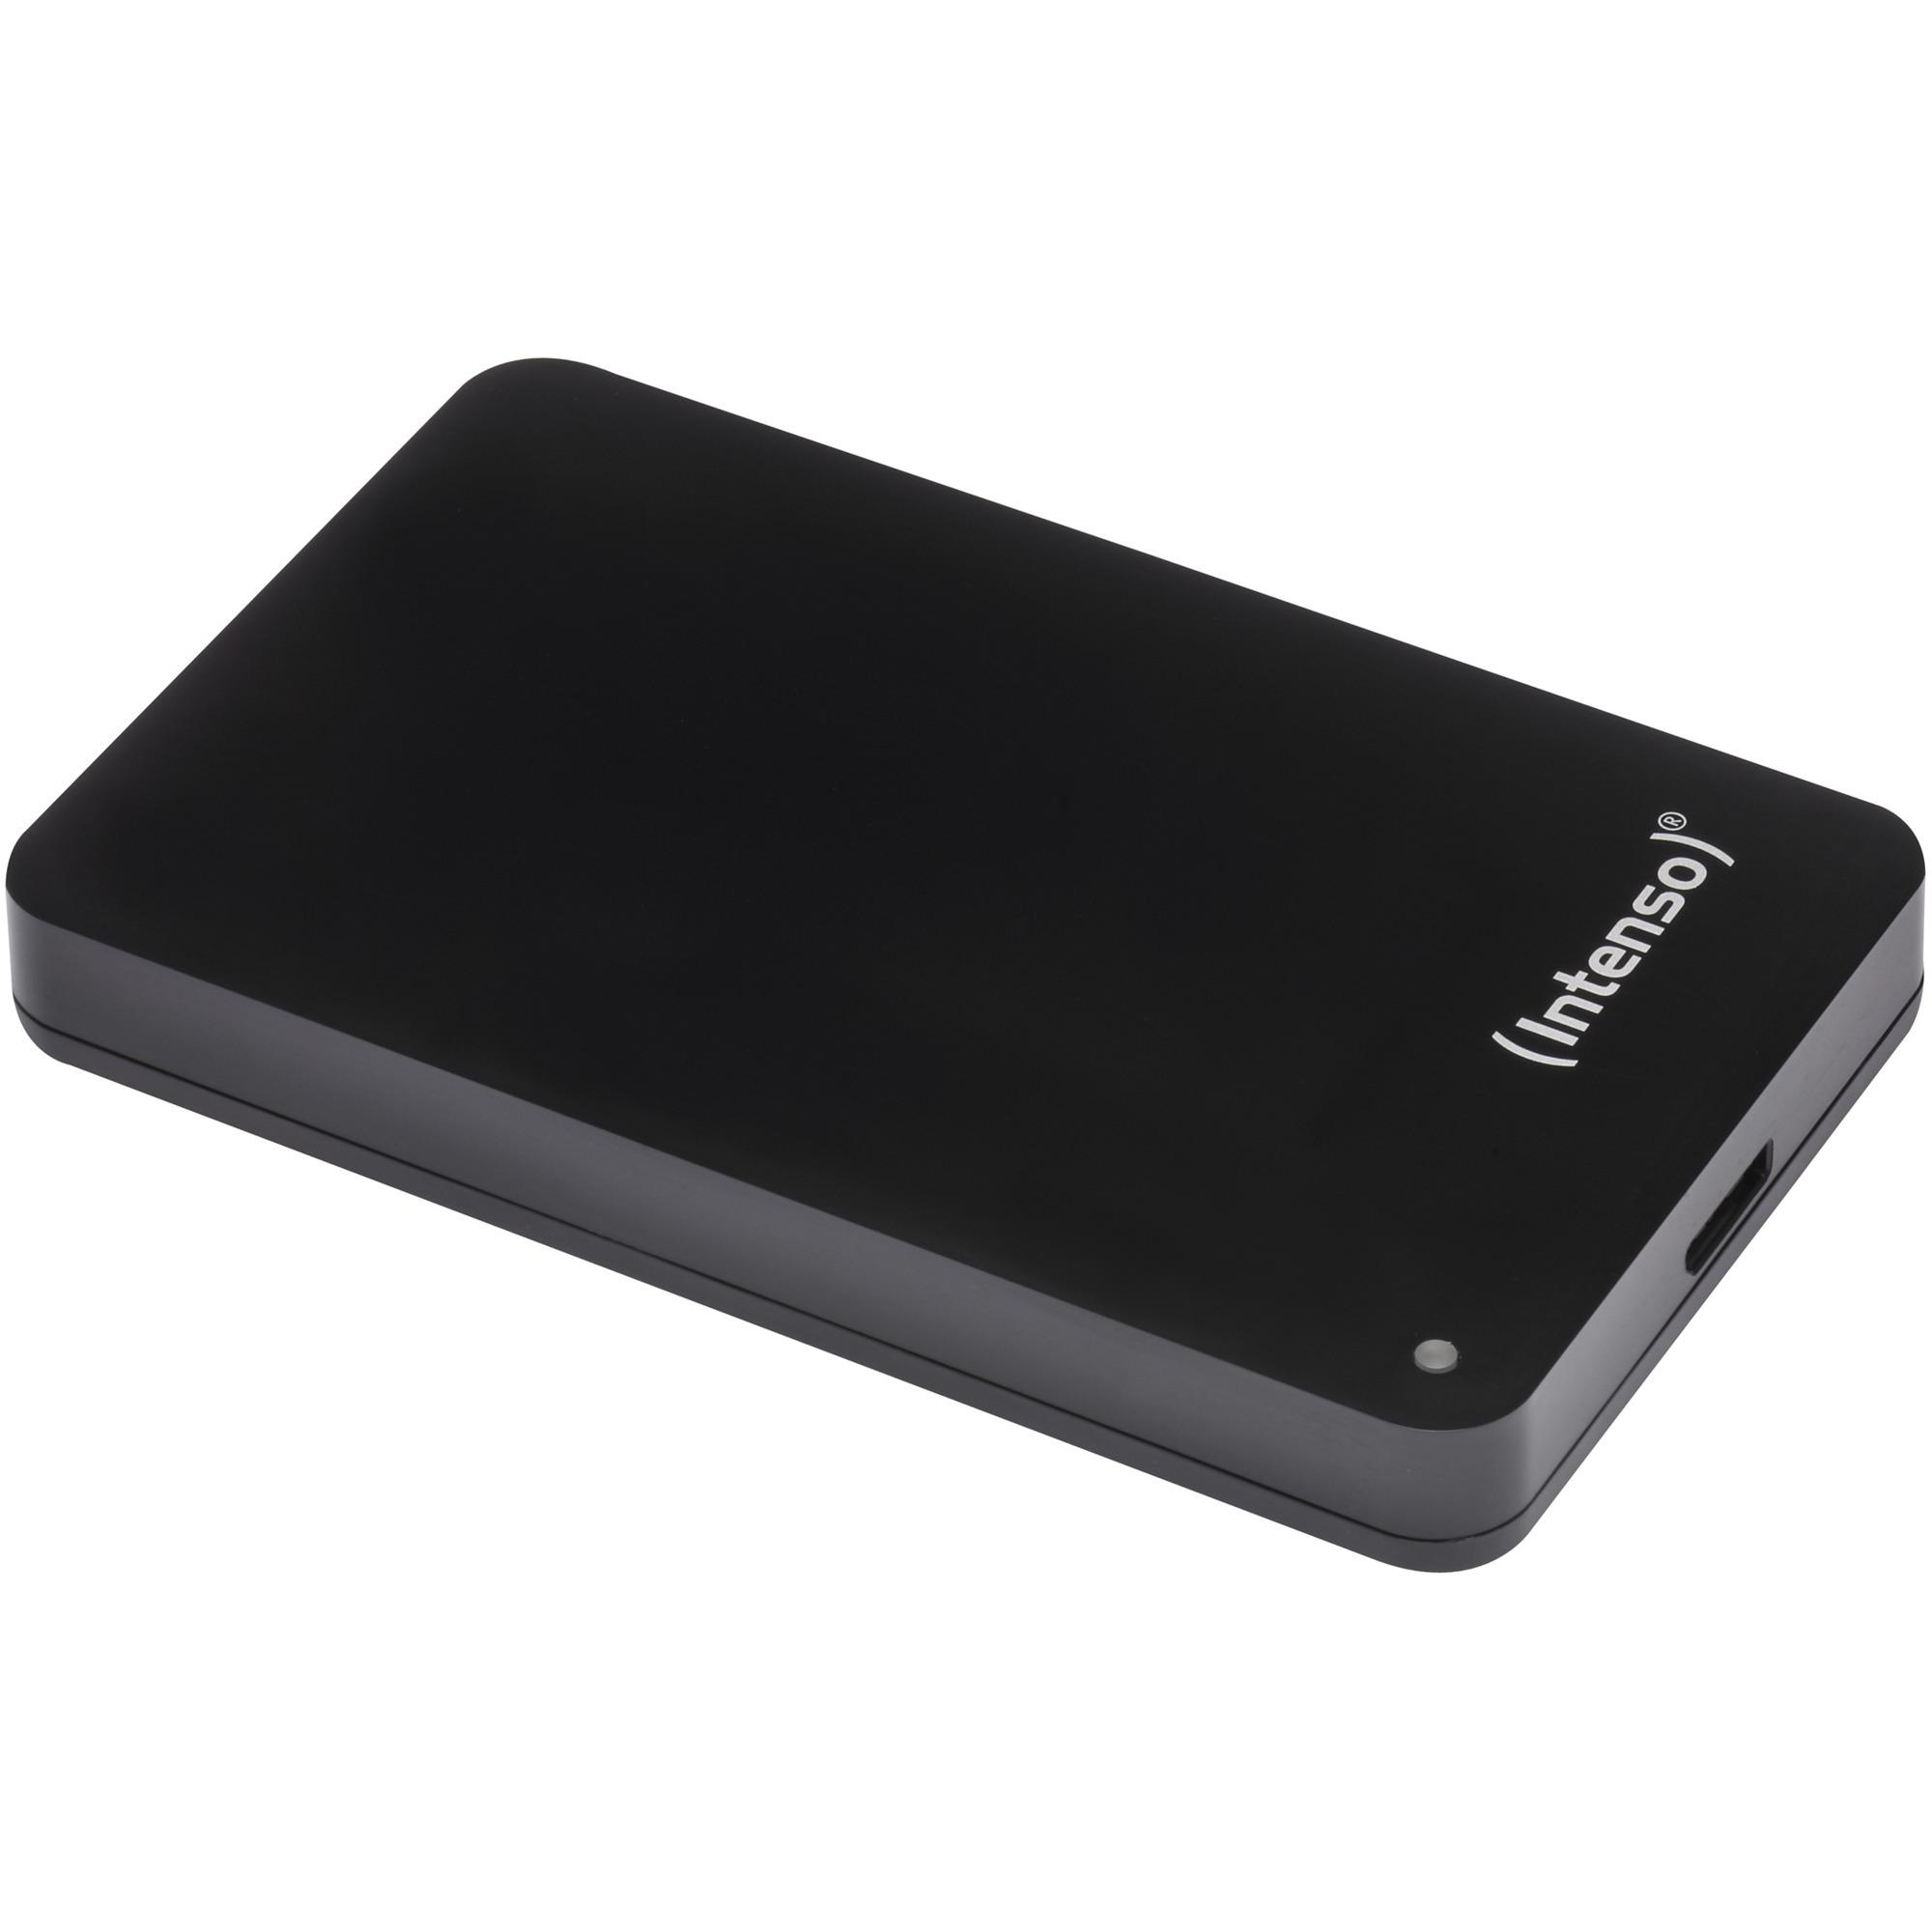 "2TB 2.5"" Memory Case USB 3.0 disco duro externo 2000 GB Negro, Unidad de disco duro"